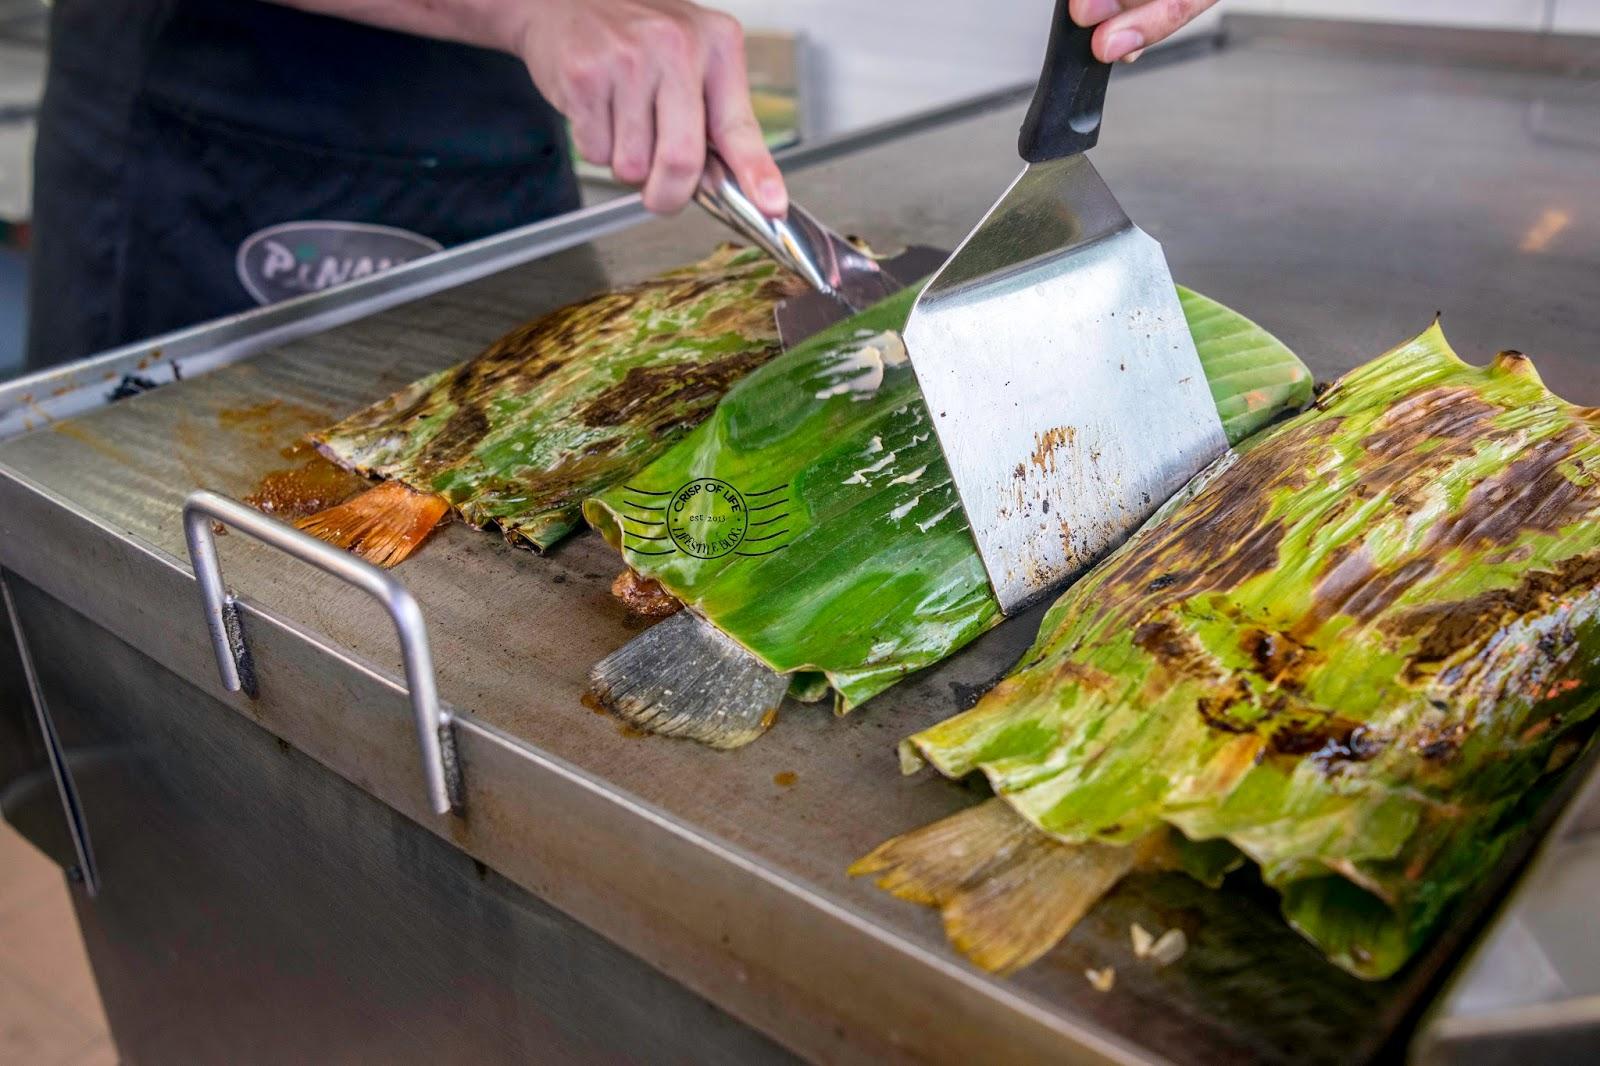 Idrus Ikan Bakar @ Batu Uban, Bayan Lepas, Penang